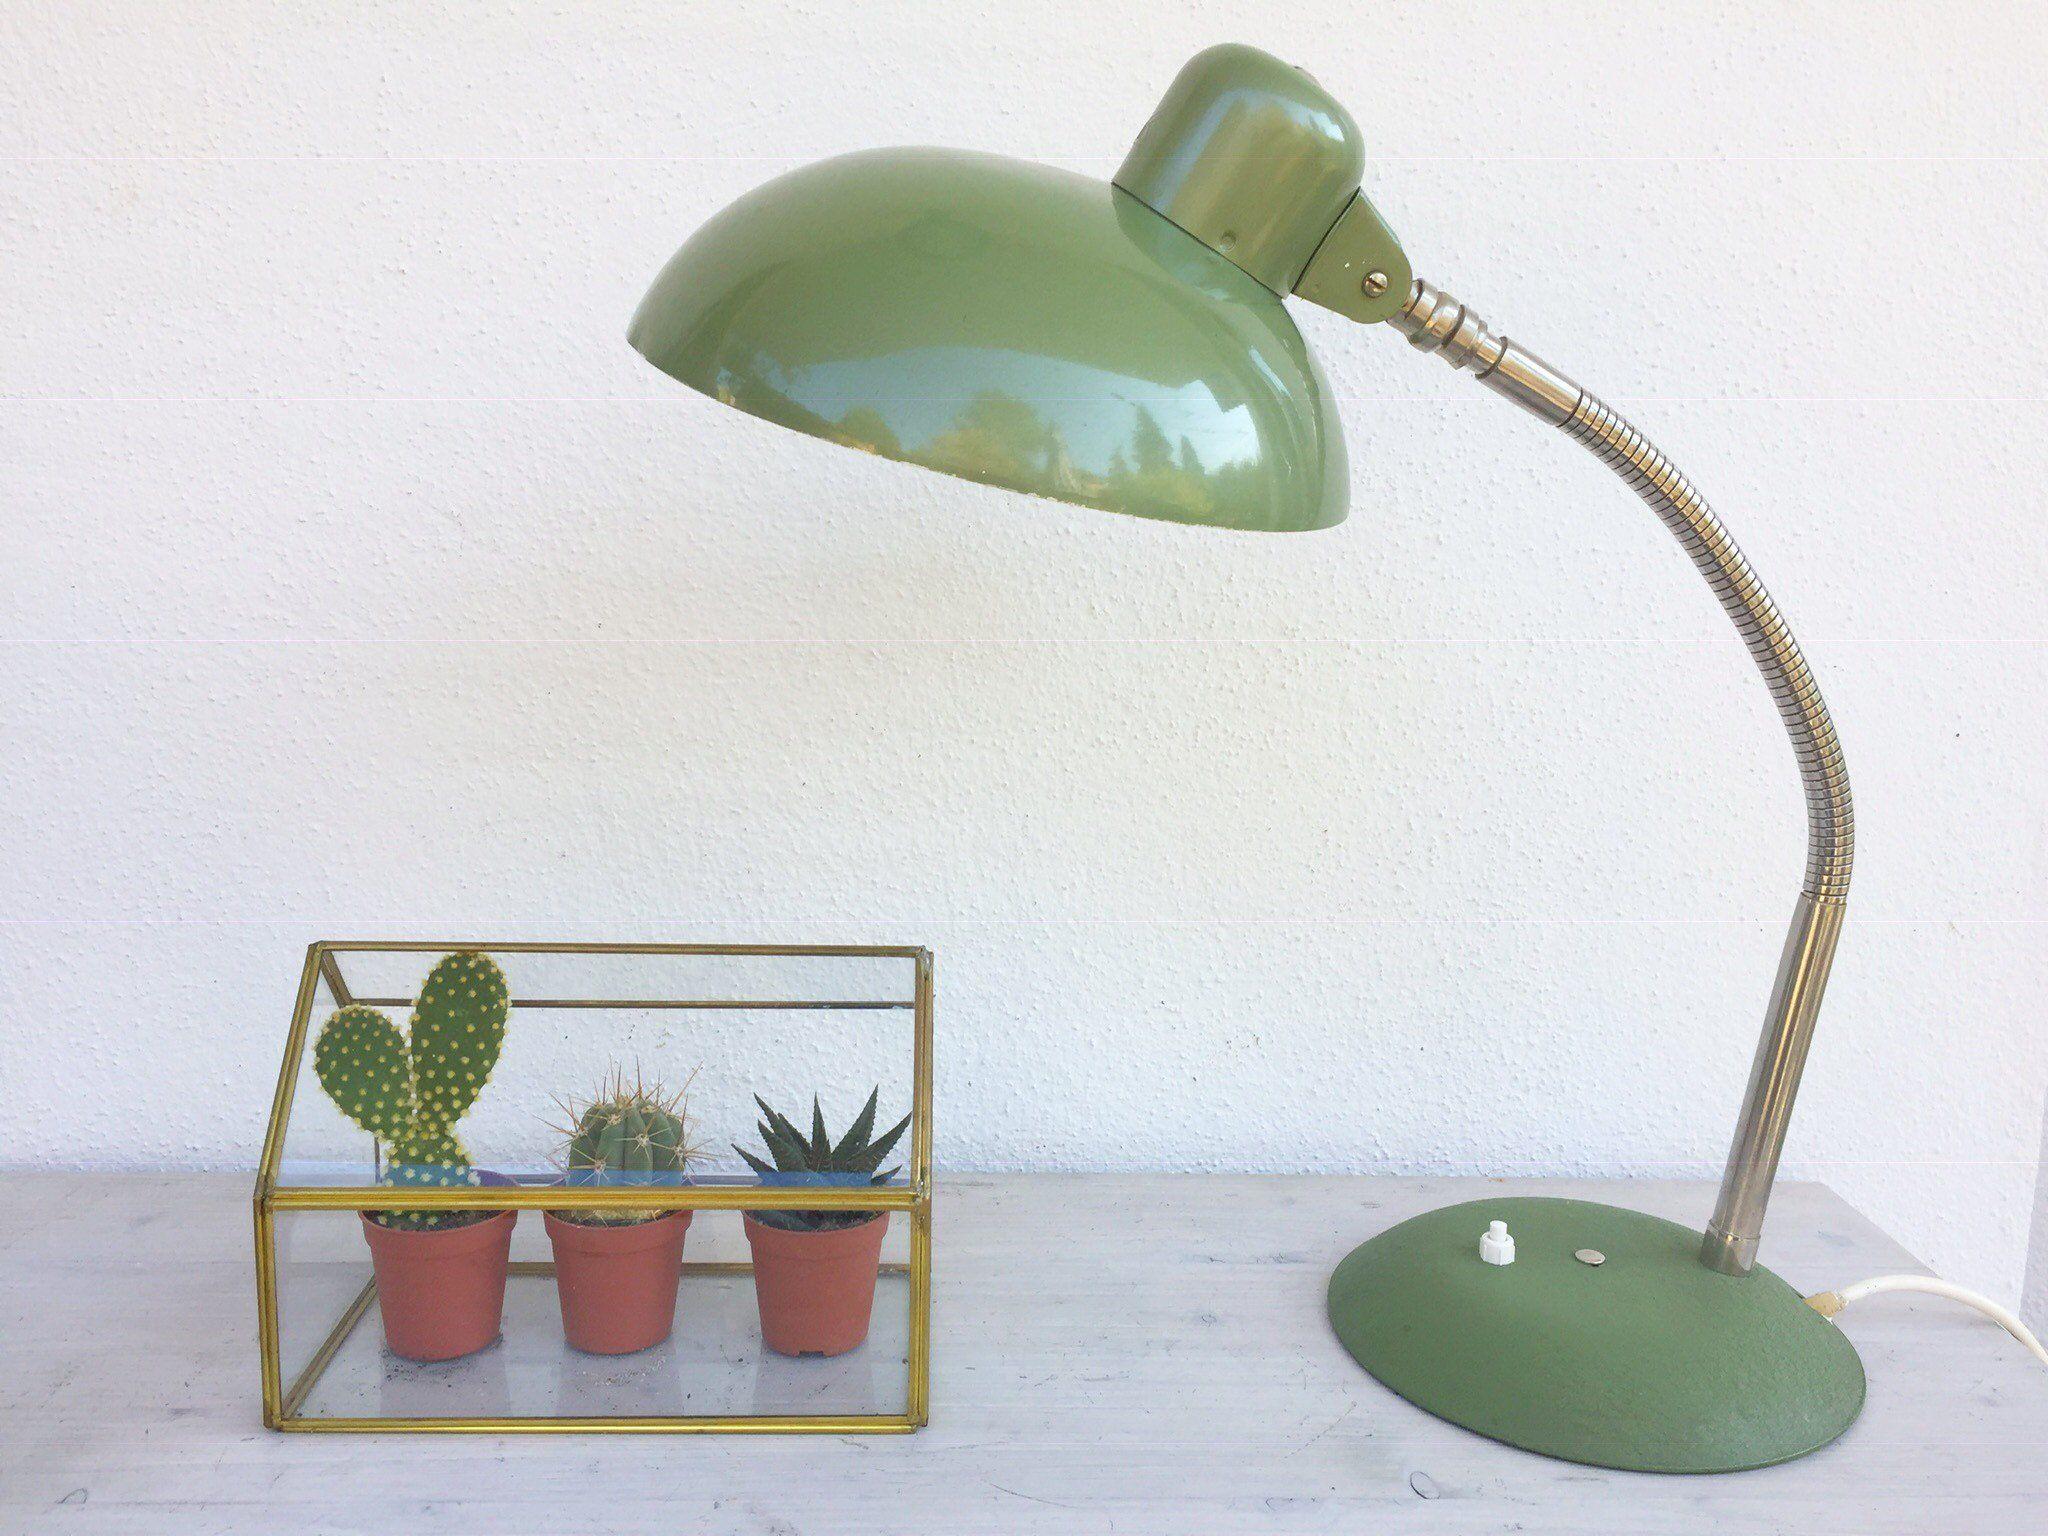 Grune Sis Schreibtischlampe Mid Century 60er Gelenklampe Lampe Desk Lamp Lamp Decor